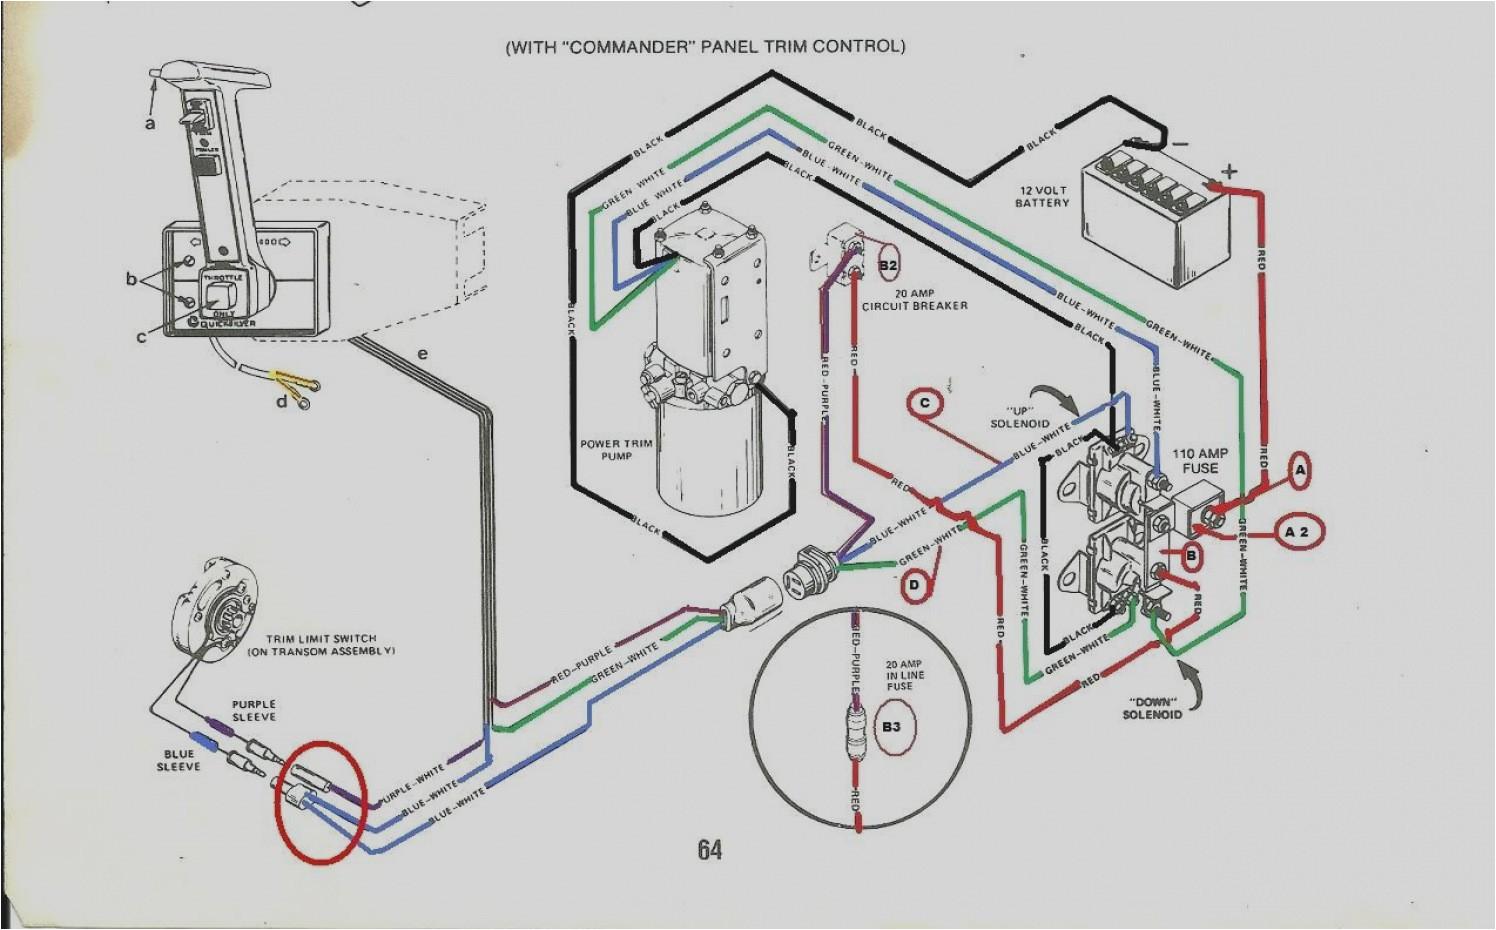 club car wiring diagram 36 volt for basic ezgo electric golf cart throughout before ezgo wiring diagram gas golf cart jpg